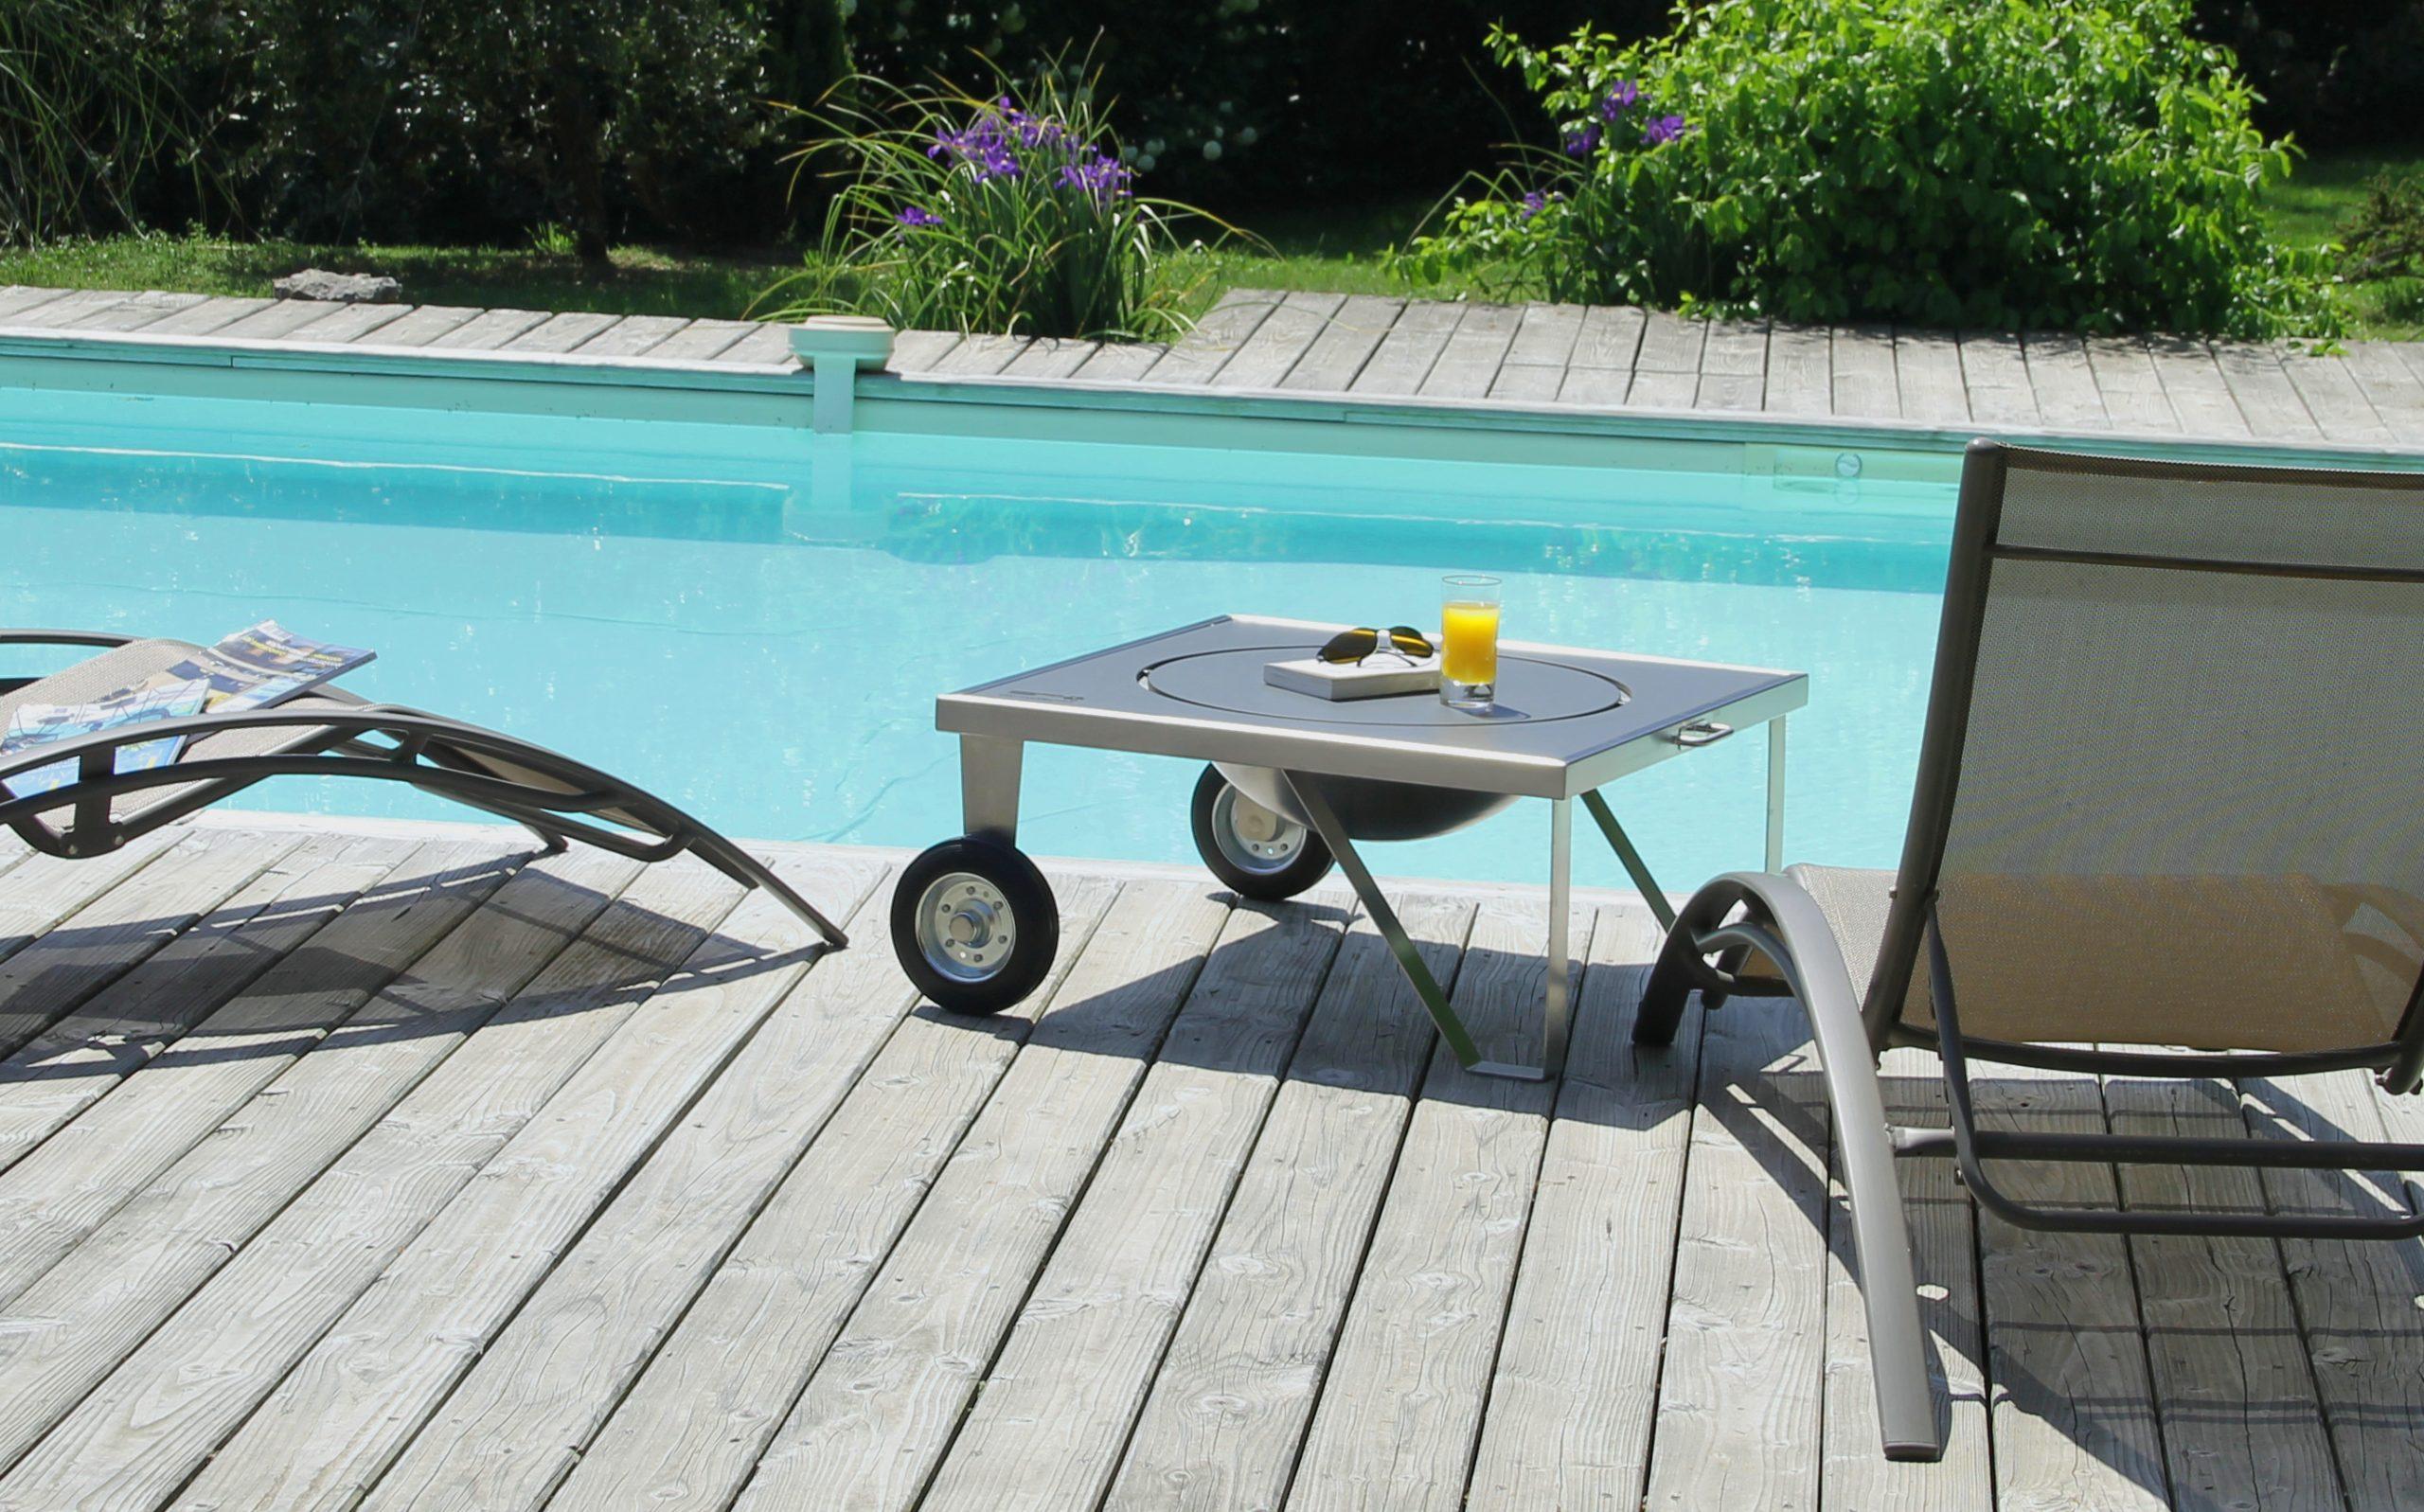 Table basse brasero inox design